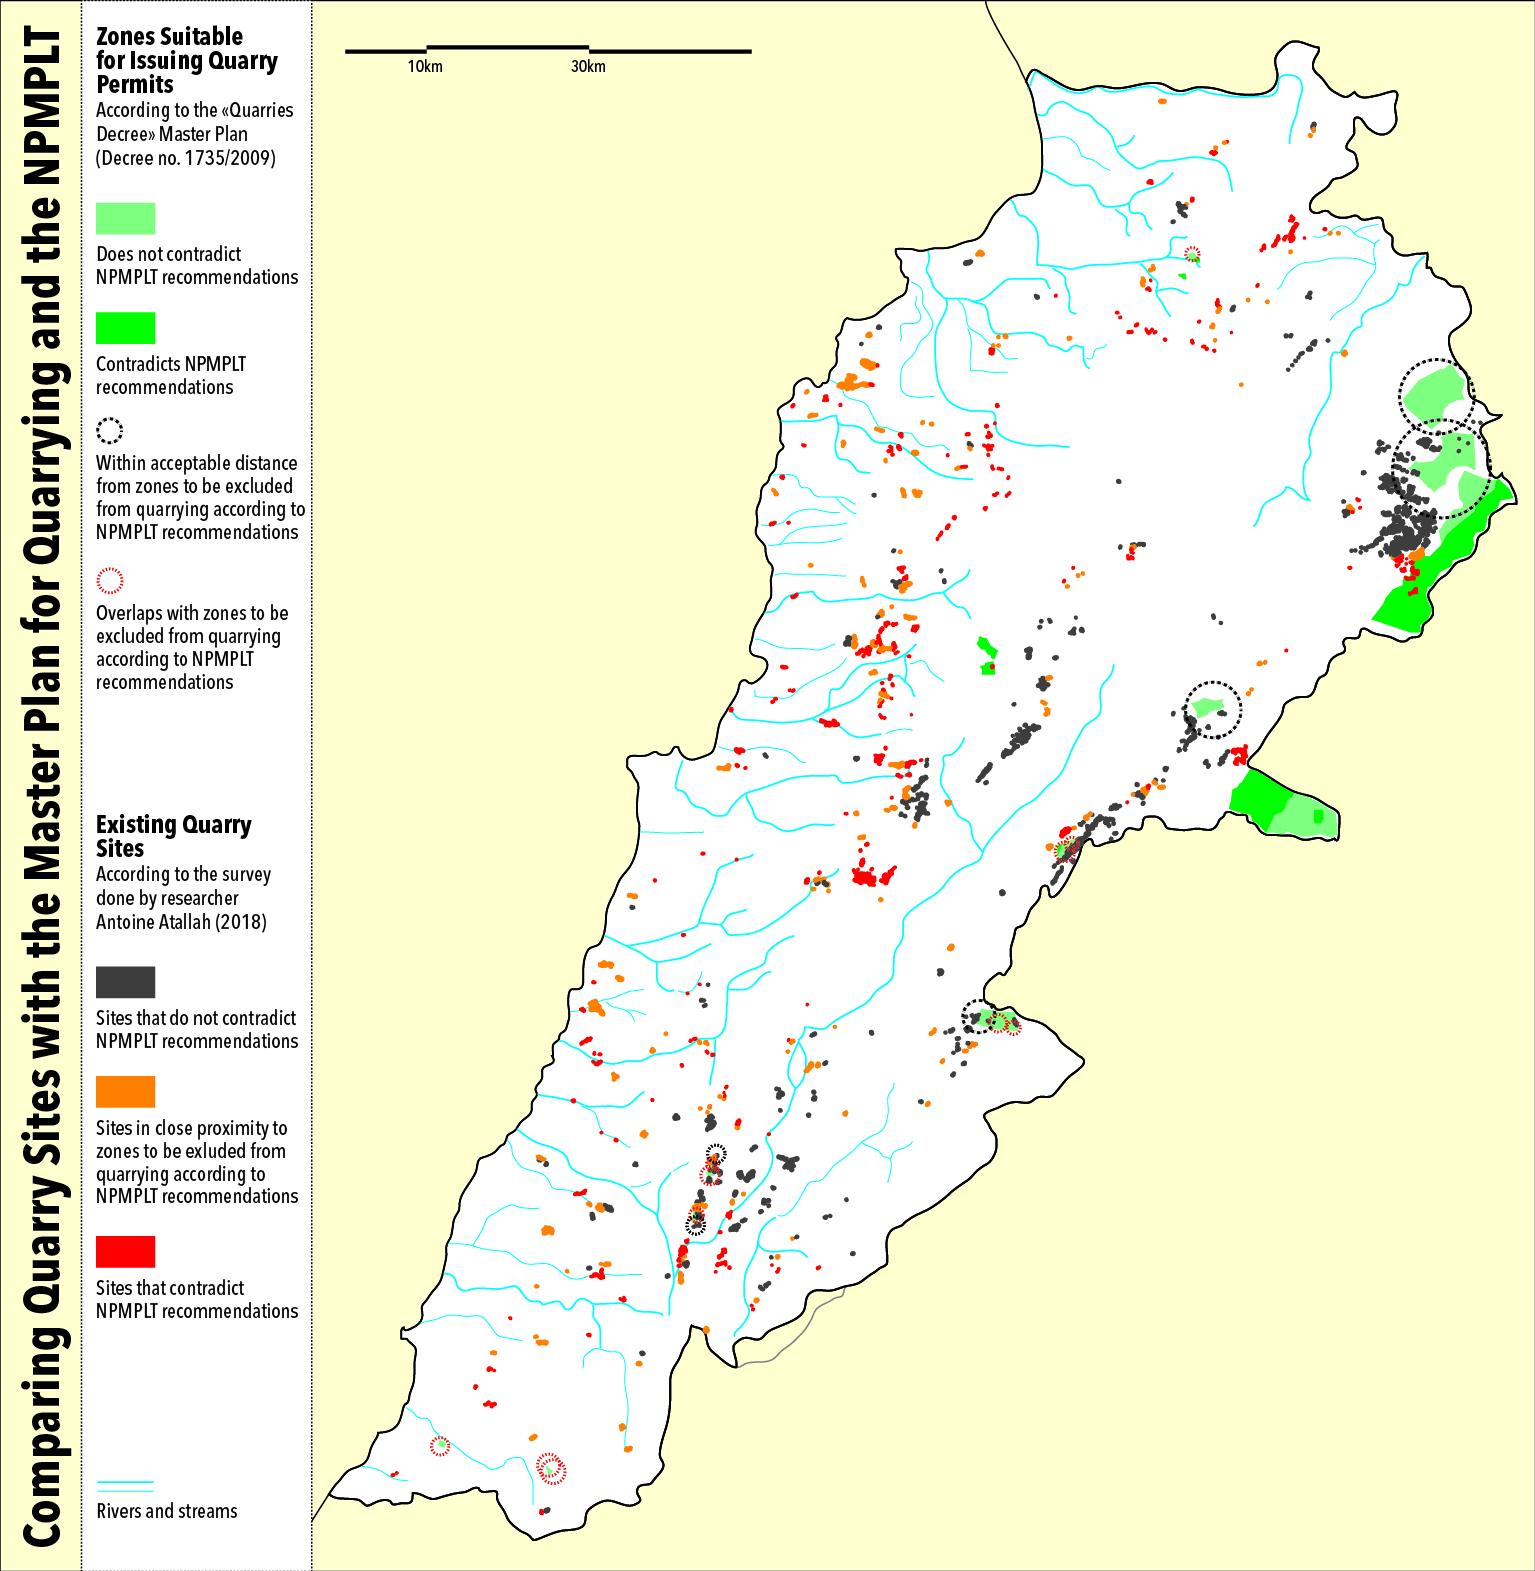 Jadaliyya - Reading the Quarries' Map in Lebanon